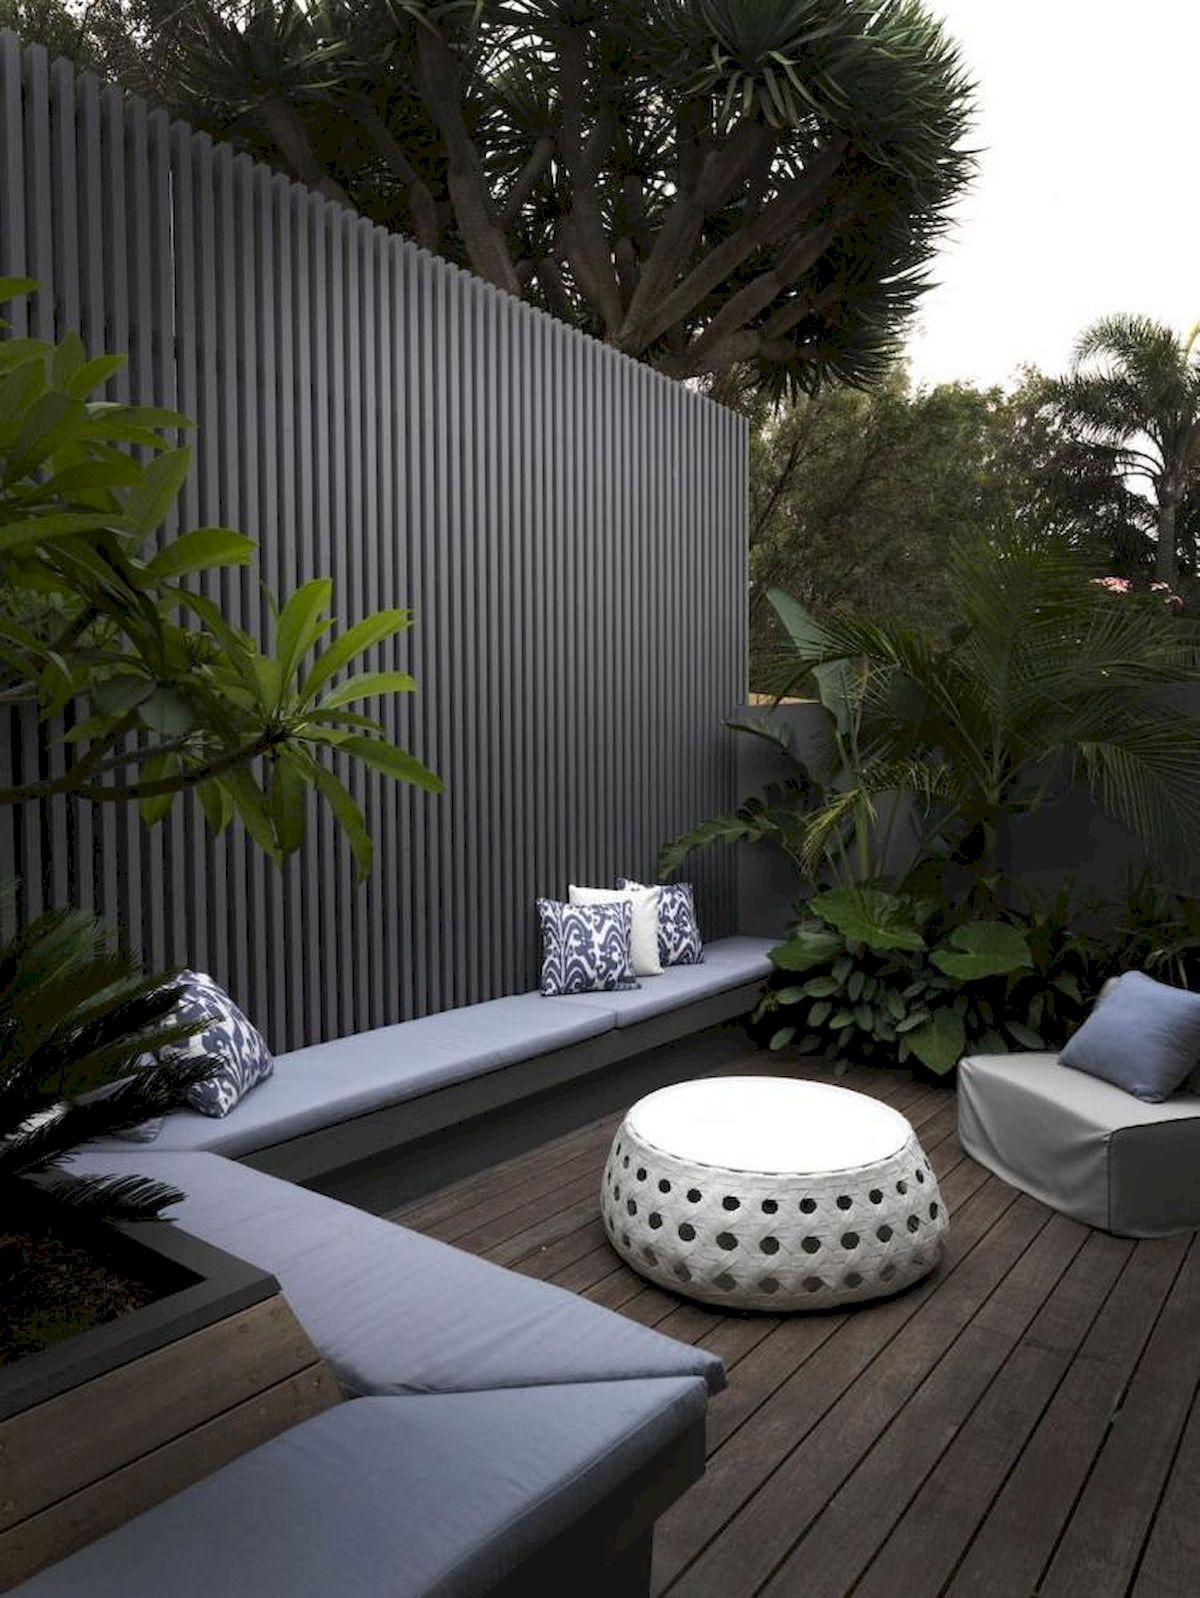 60 Awesome DIY Backyard Privacy Design And Decor Ideas (44)